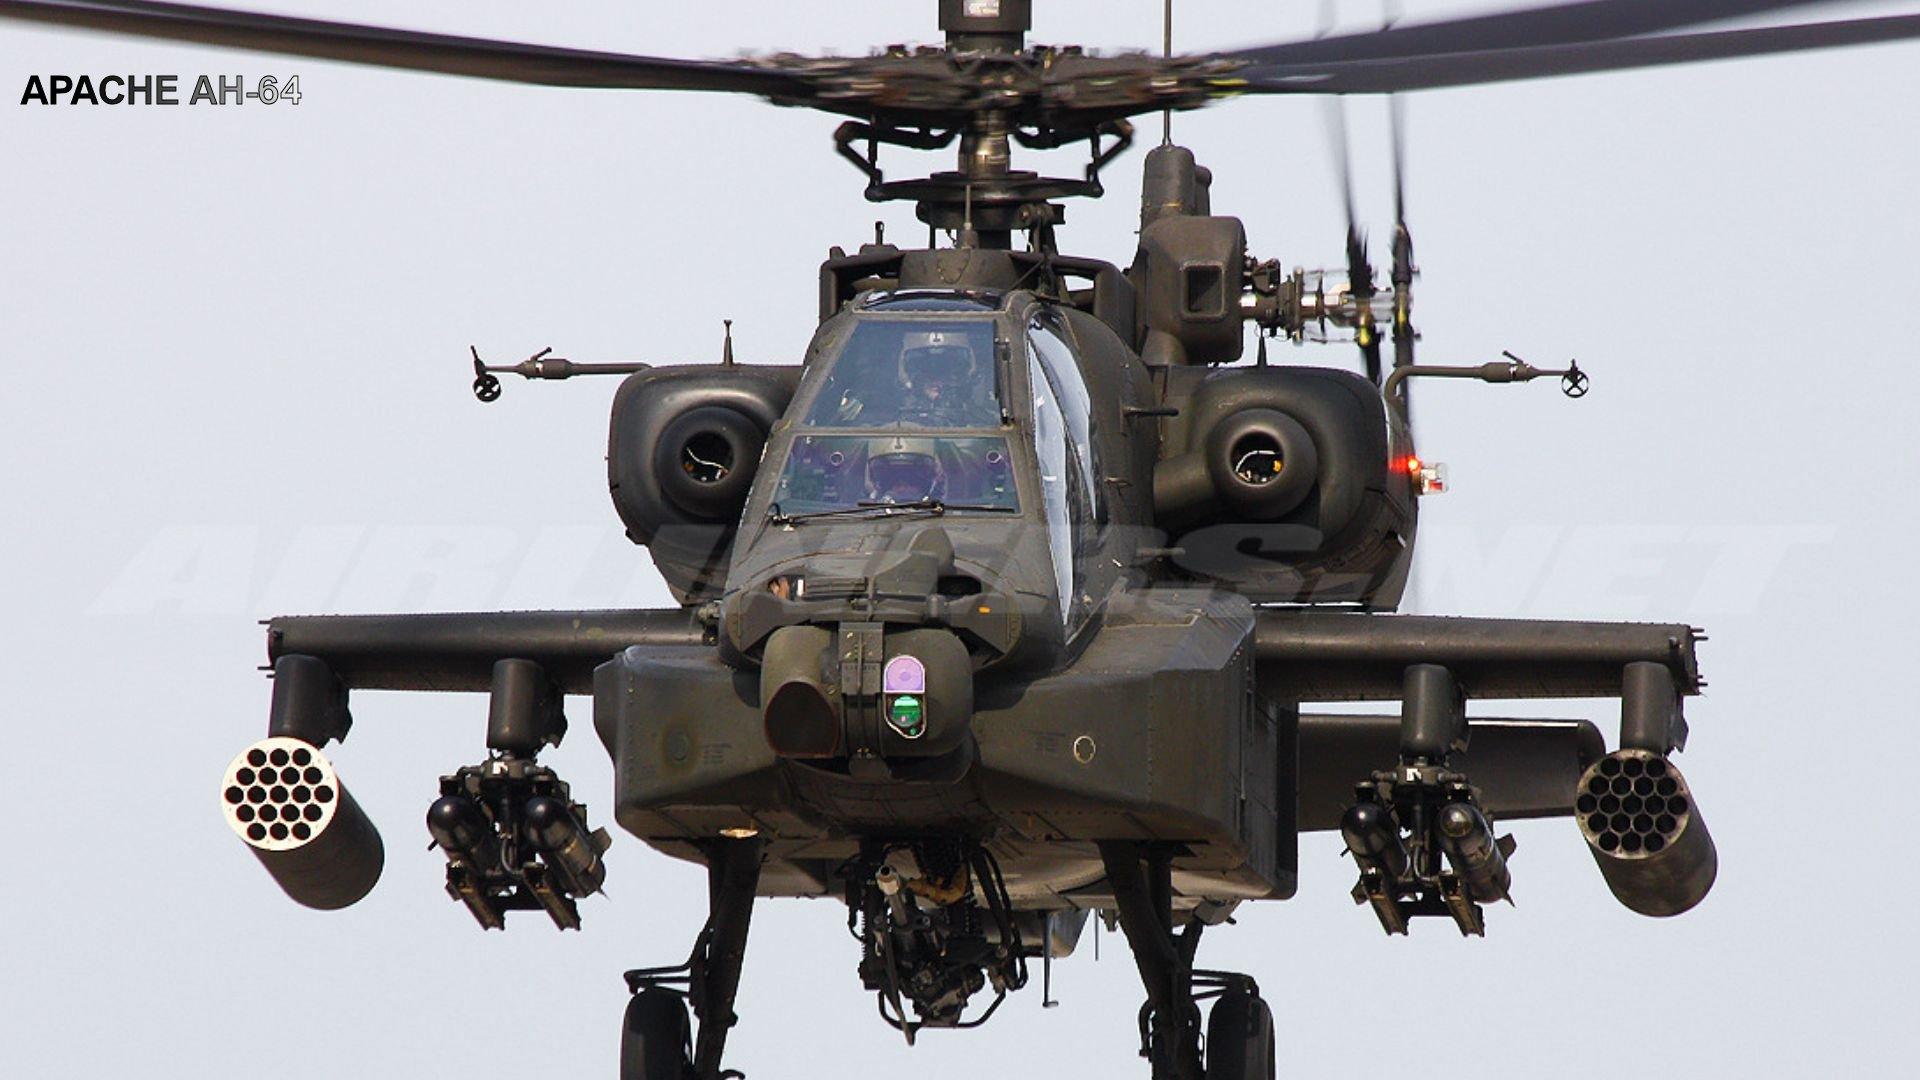 Apache Helicopter Wallpaper Desktop: Apache Wallpaper